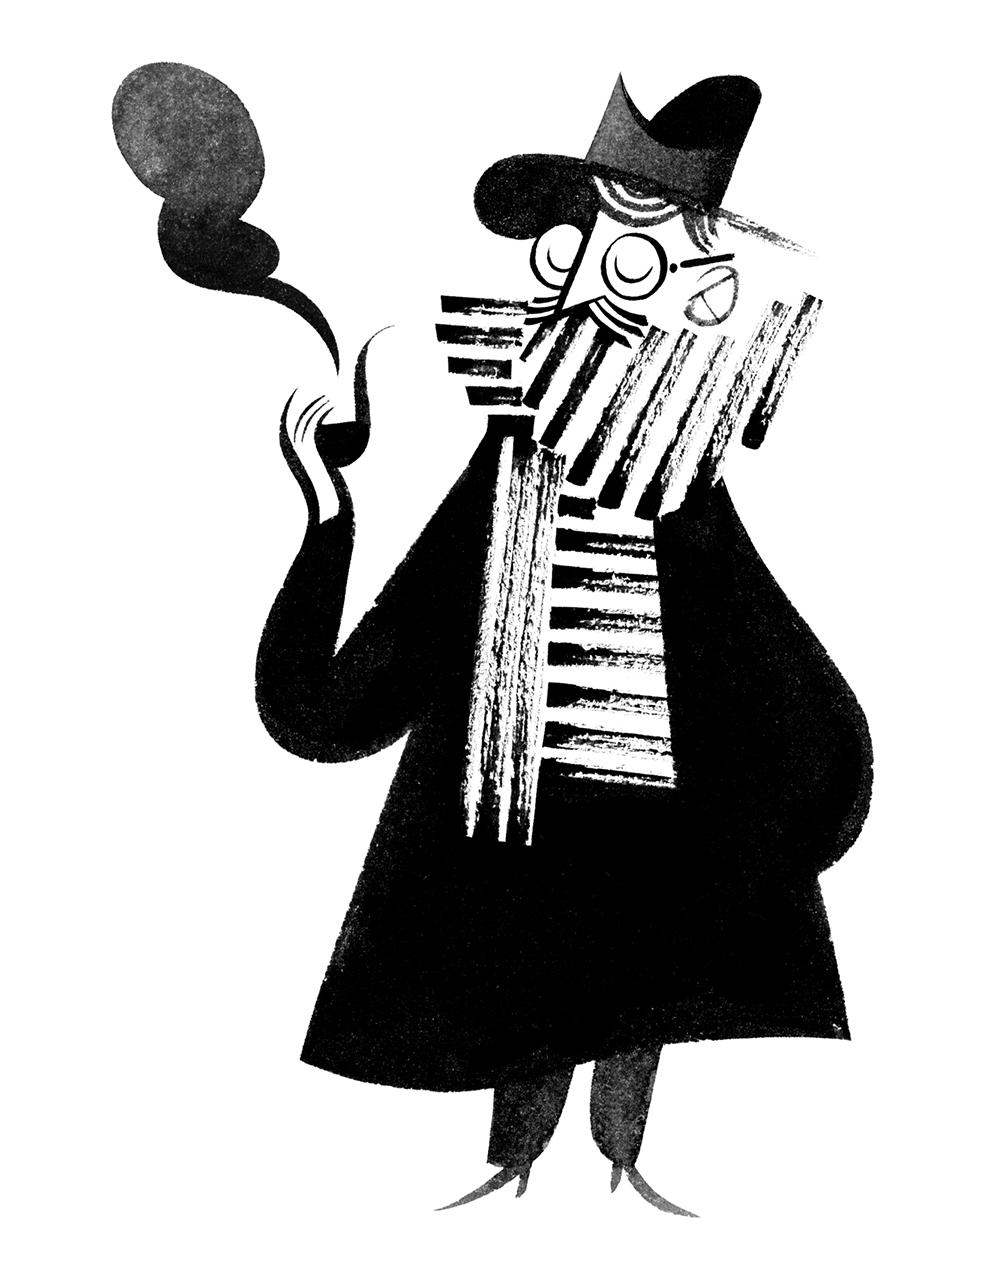 Roman Muradov : the New Yorker 01.2014 #illustration #design ...